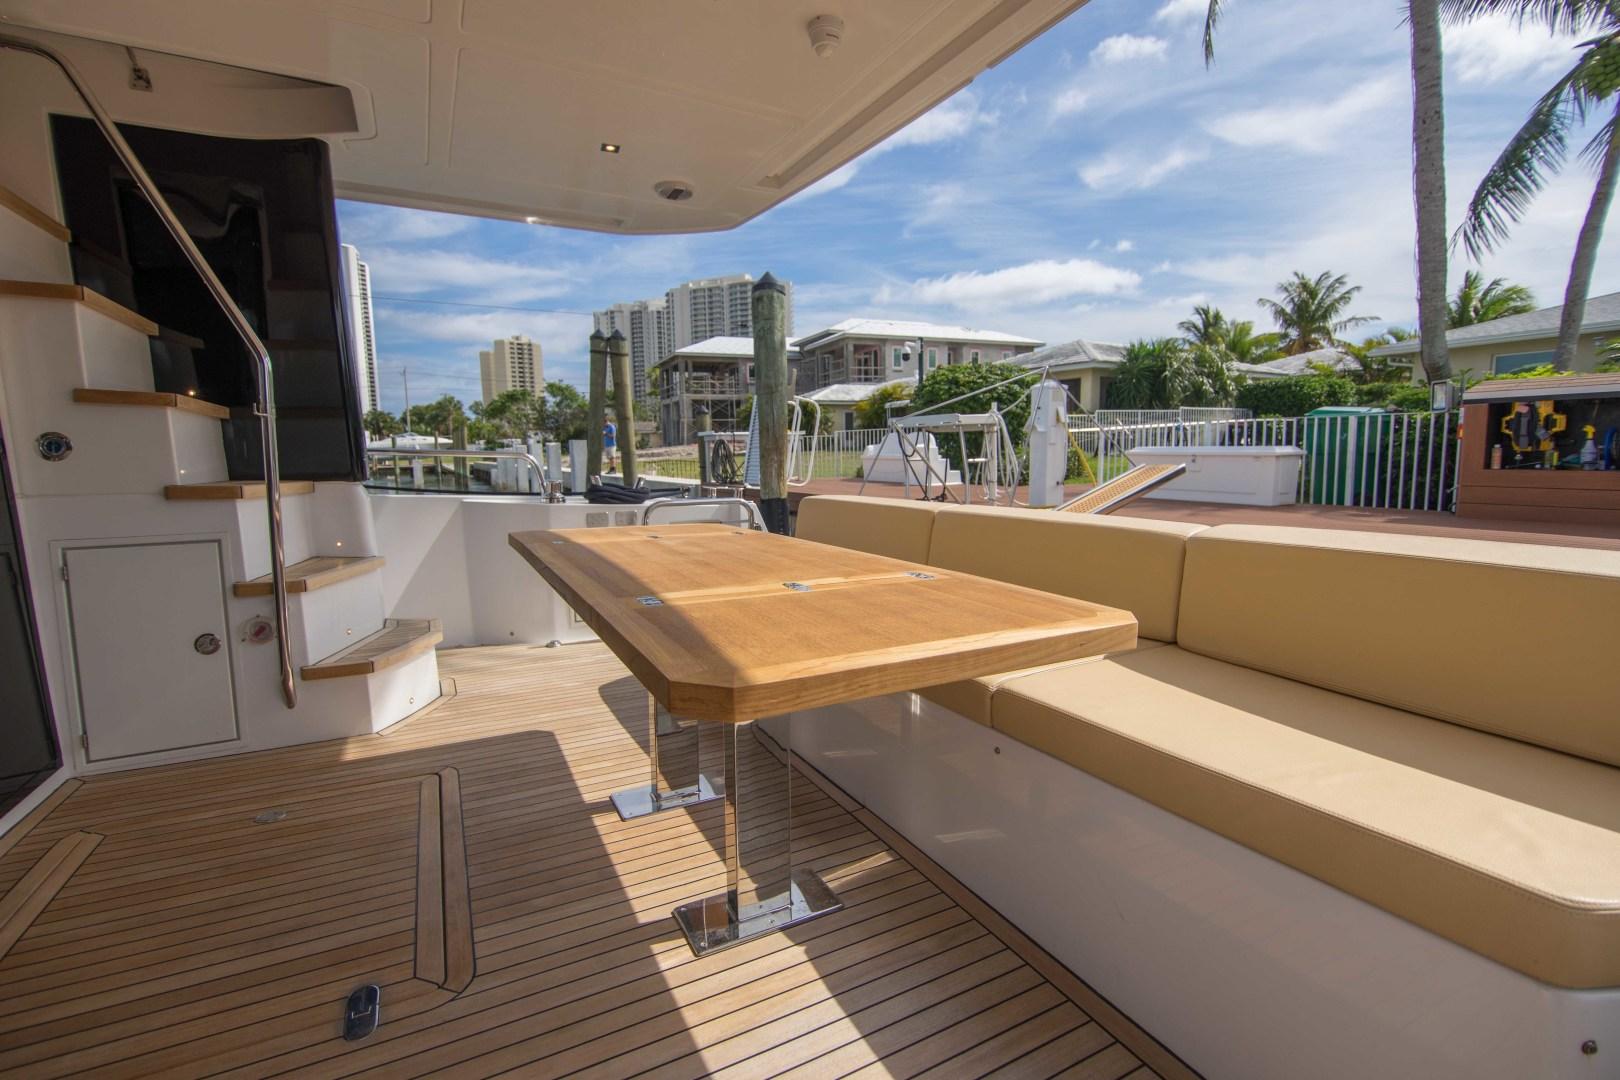 Sundeck-58 Sport 2019-LJ IV Singer Island-Florida-United States-Aft Deck-1373060 | Thumbnail